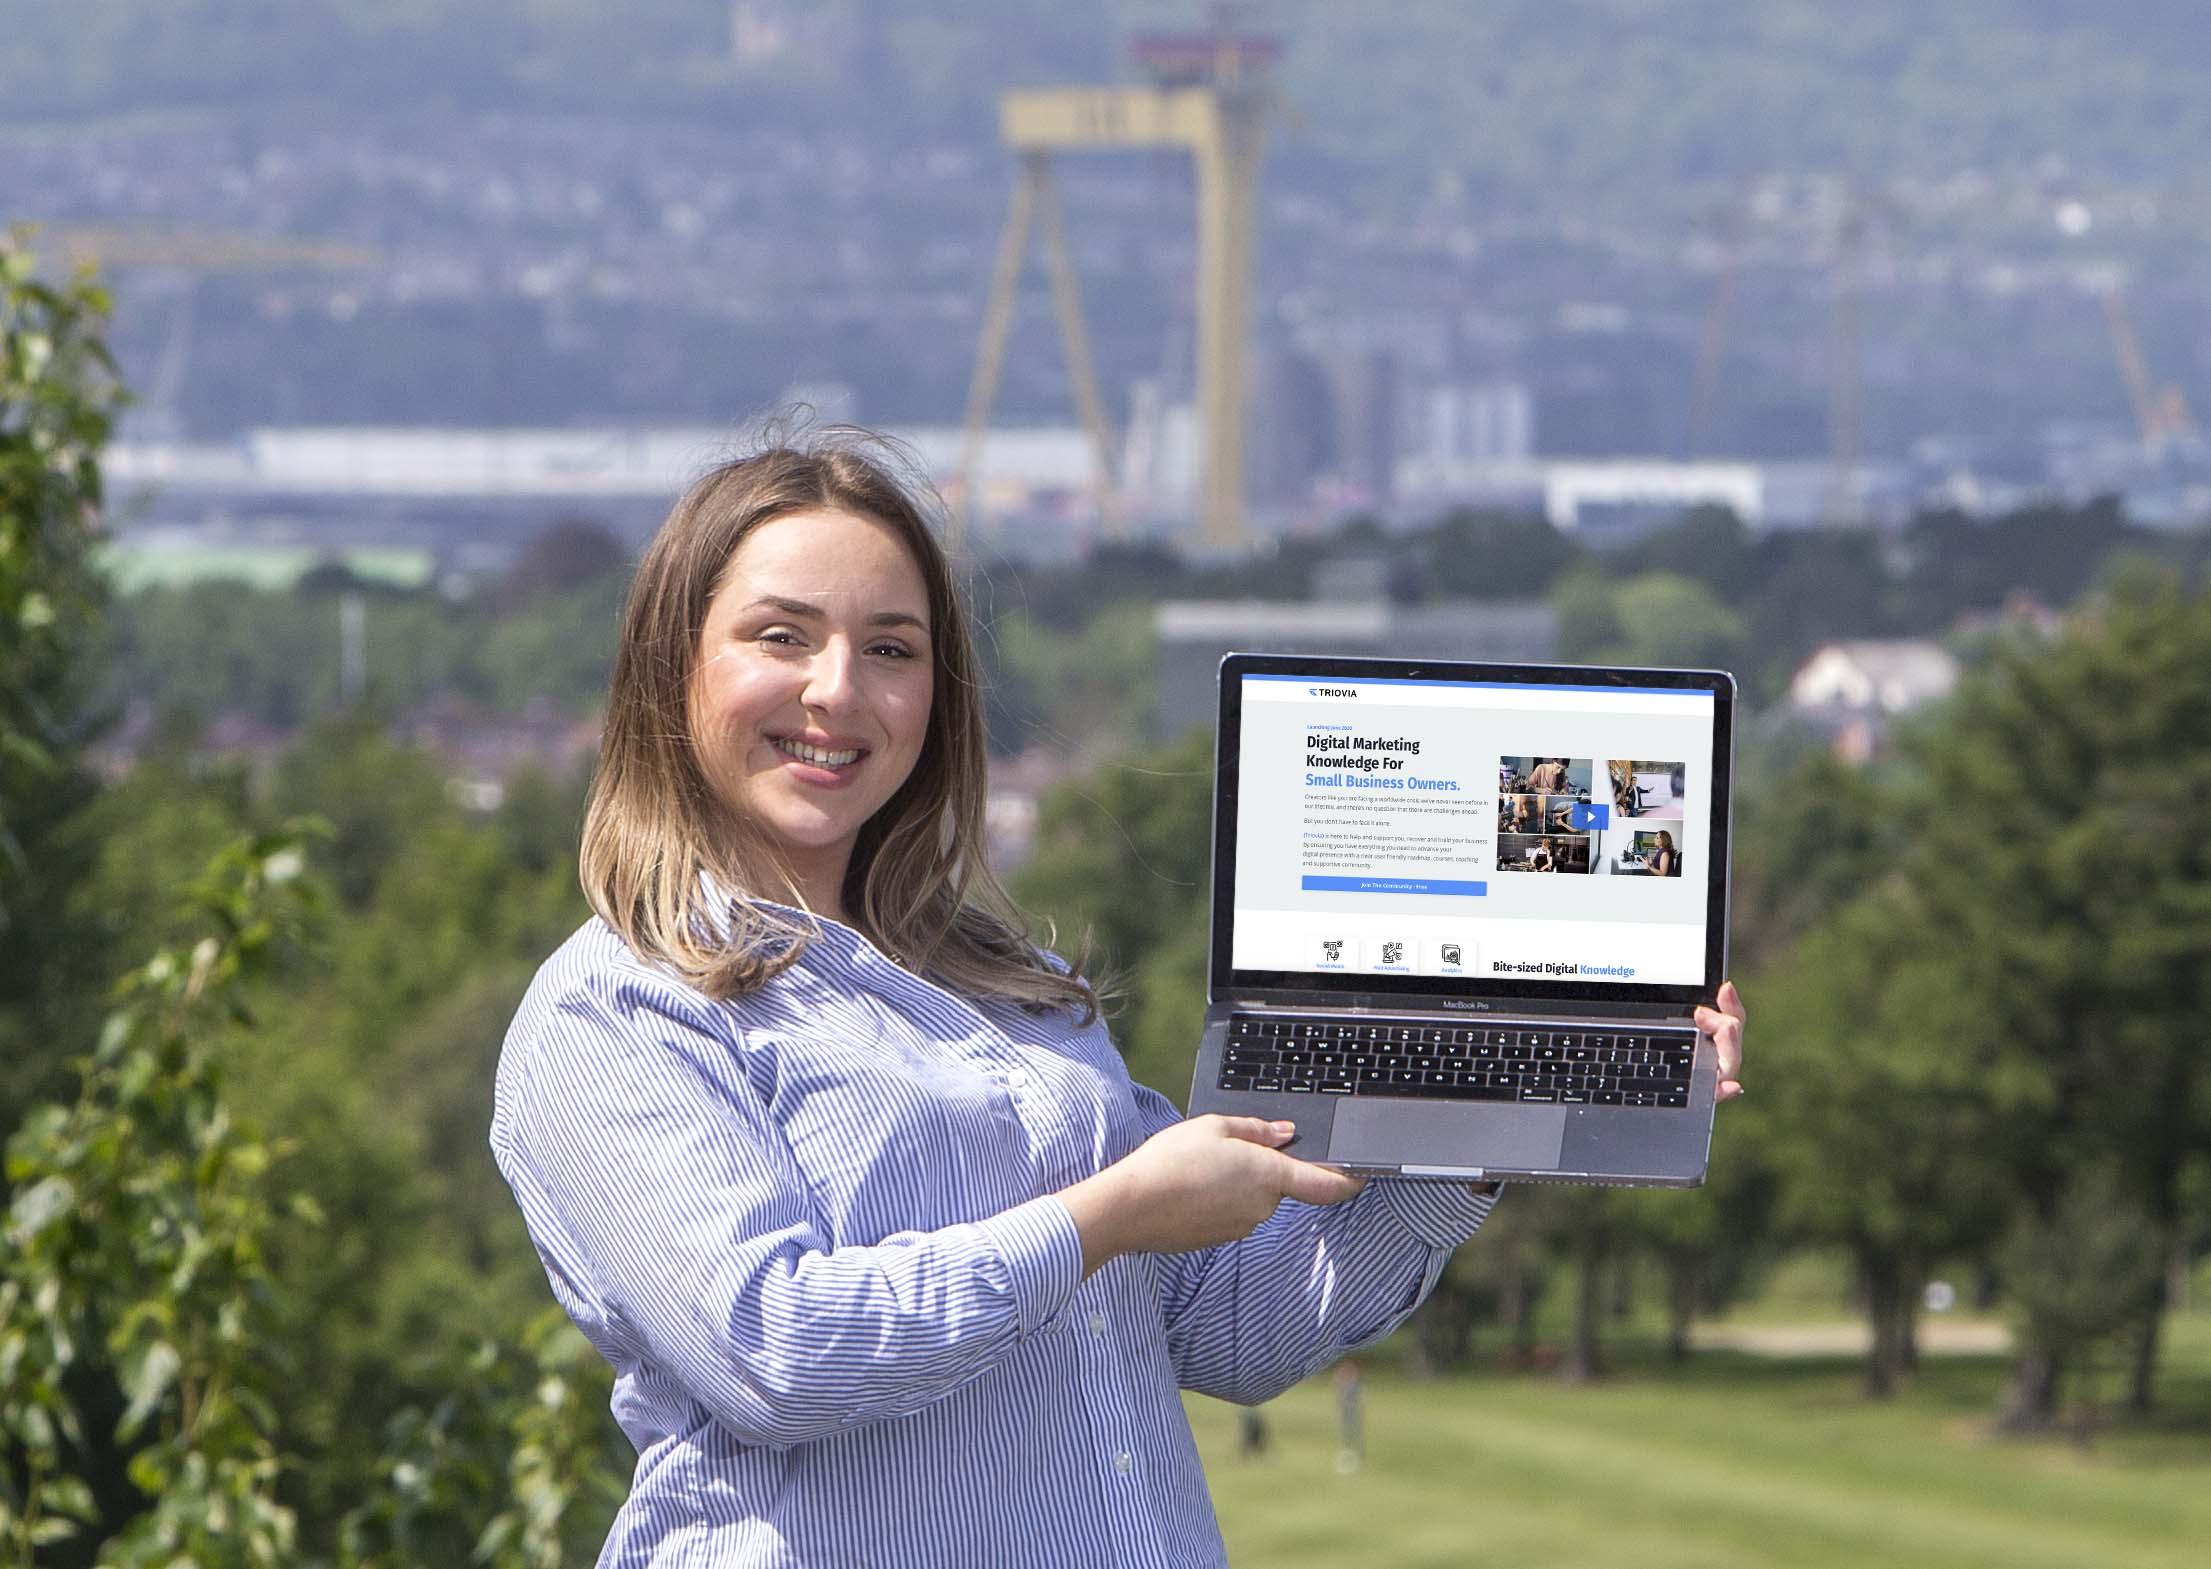 Triovia to Launch a Revolutionary Digital Media Web-Based Knowledge Platform This June